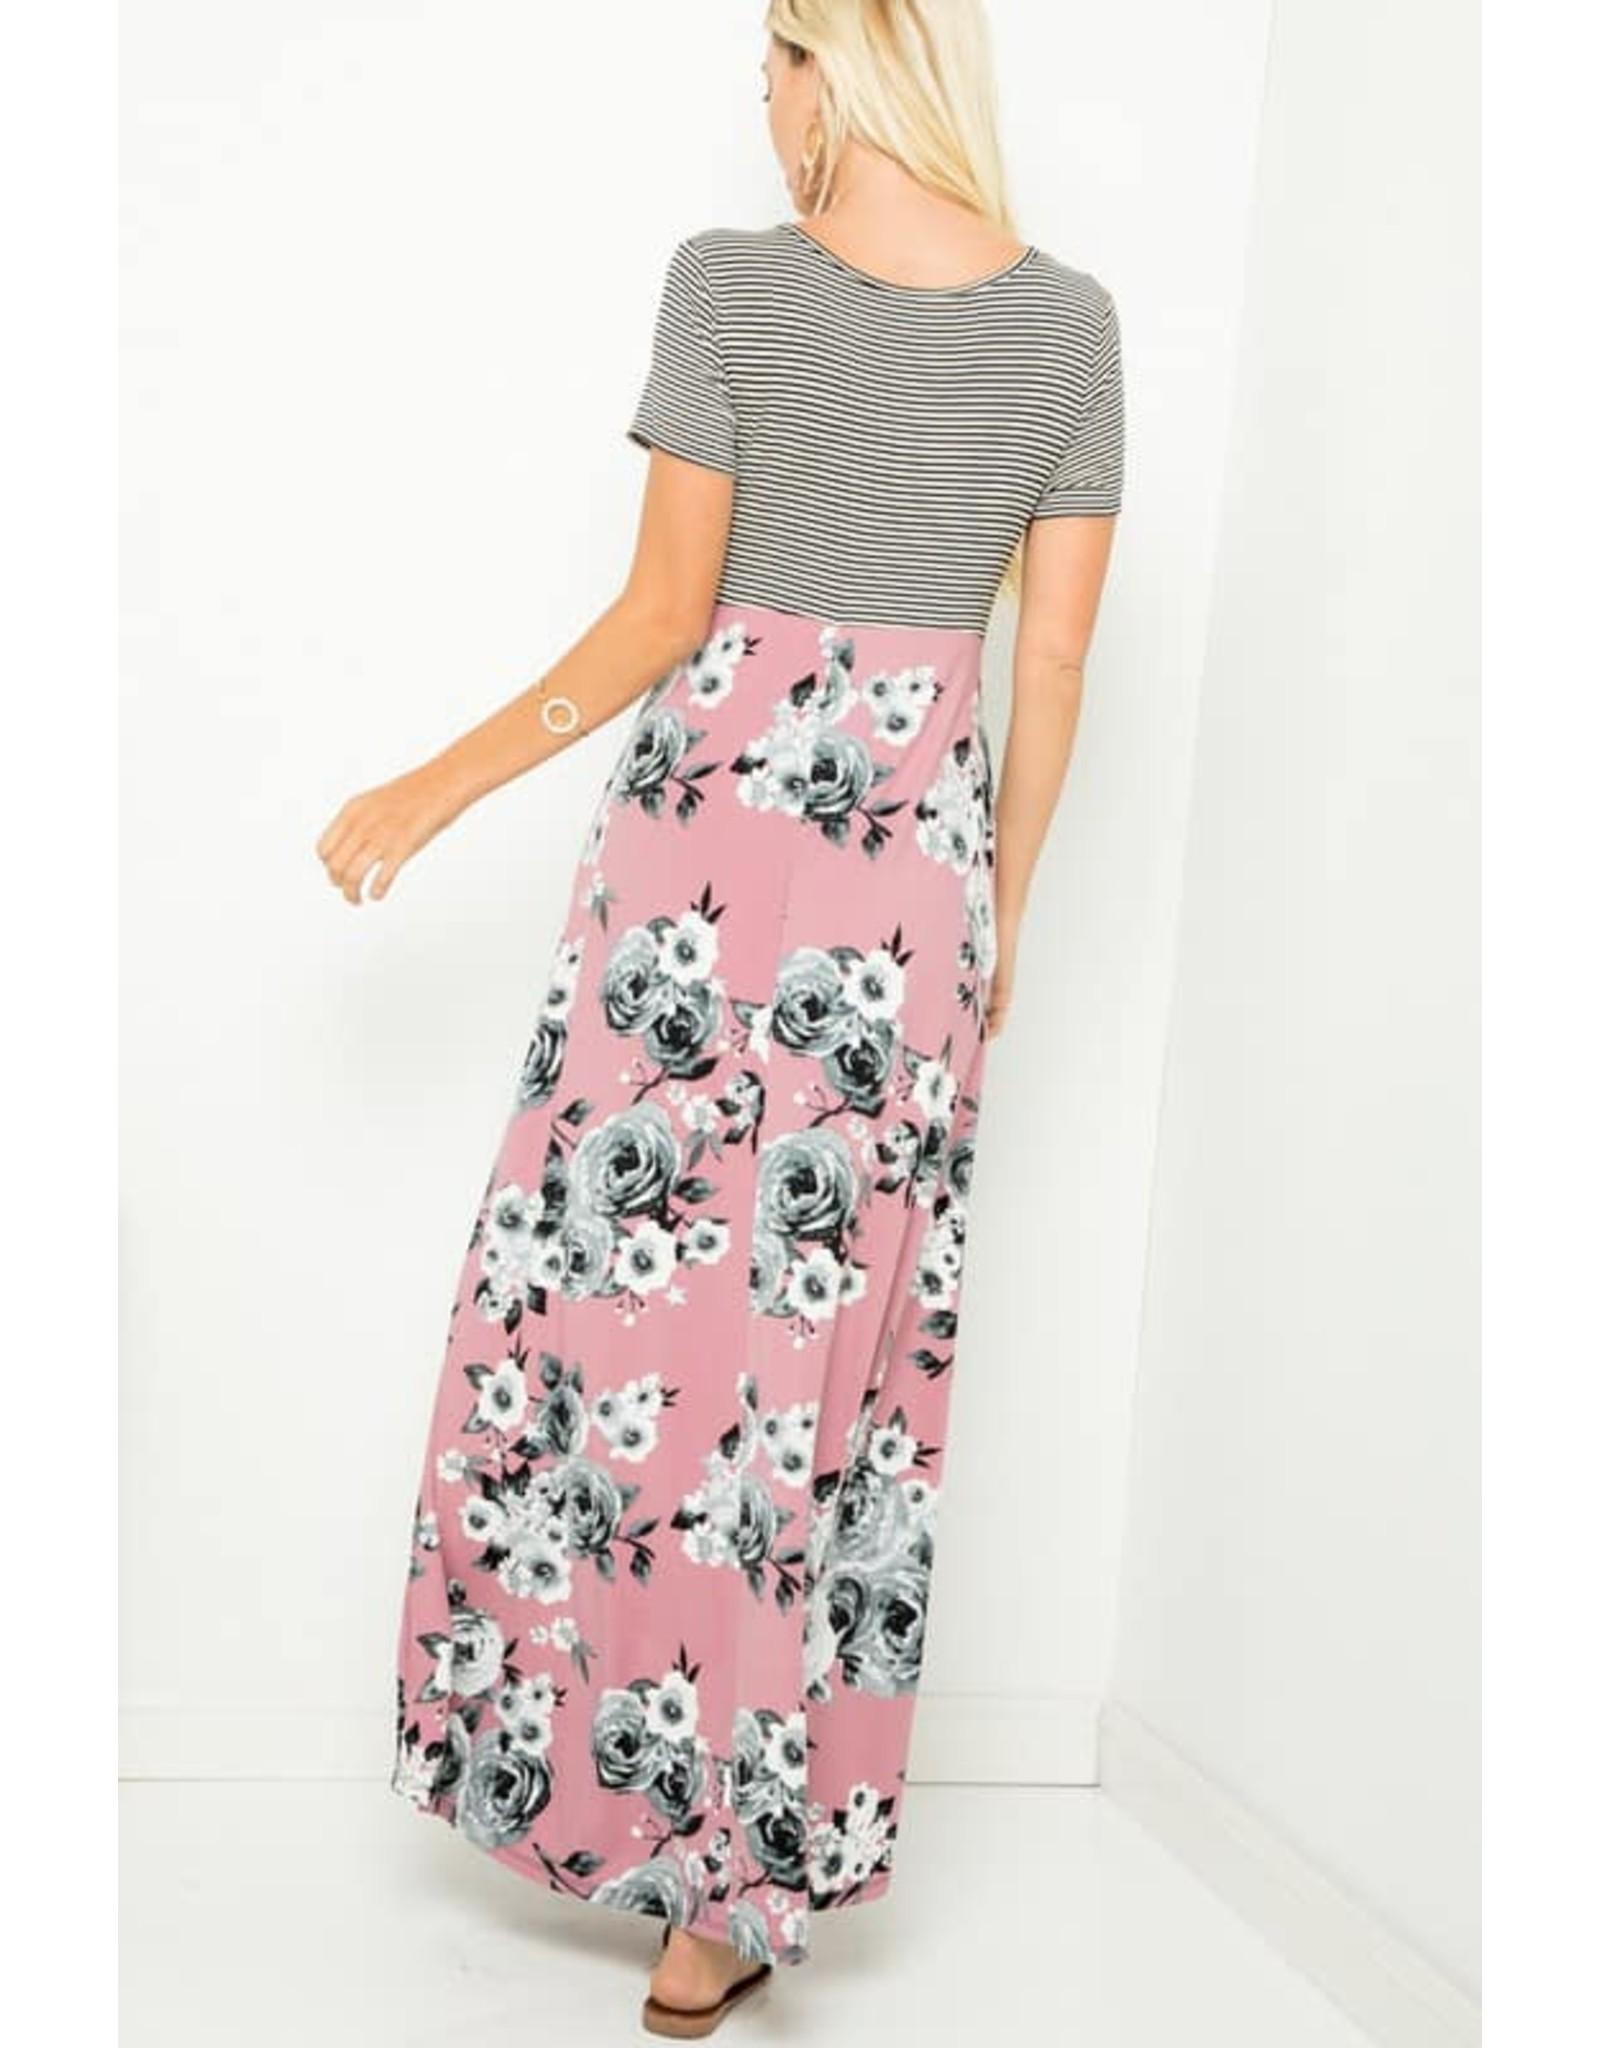 Stripe & Floral Maxi Dress Mauve Small